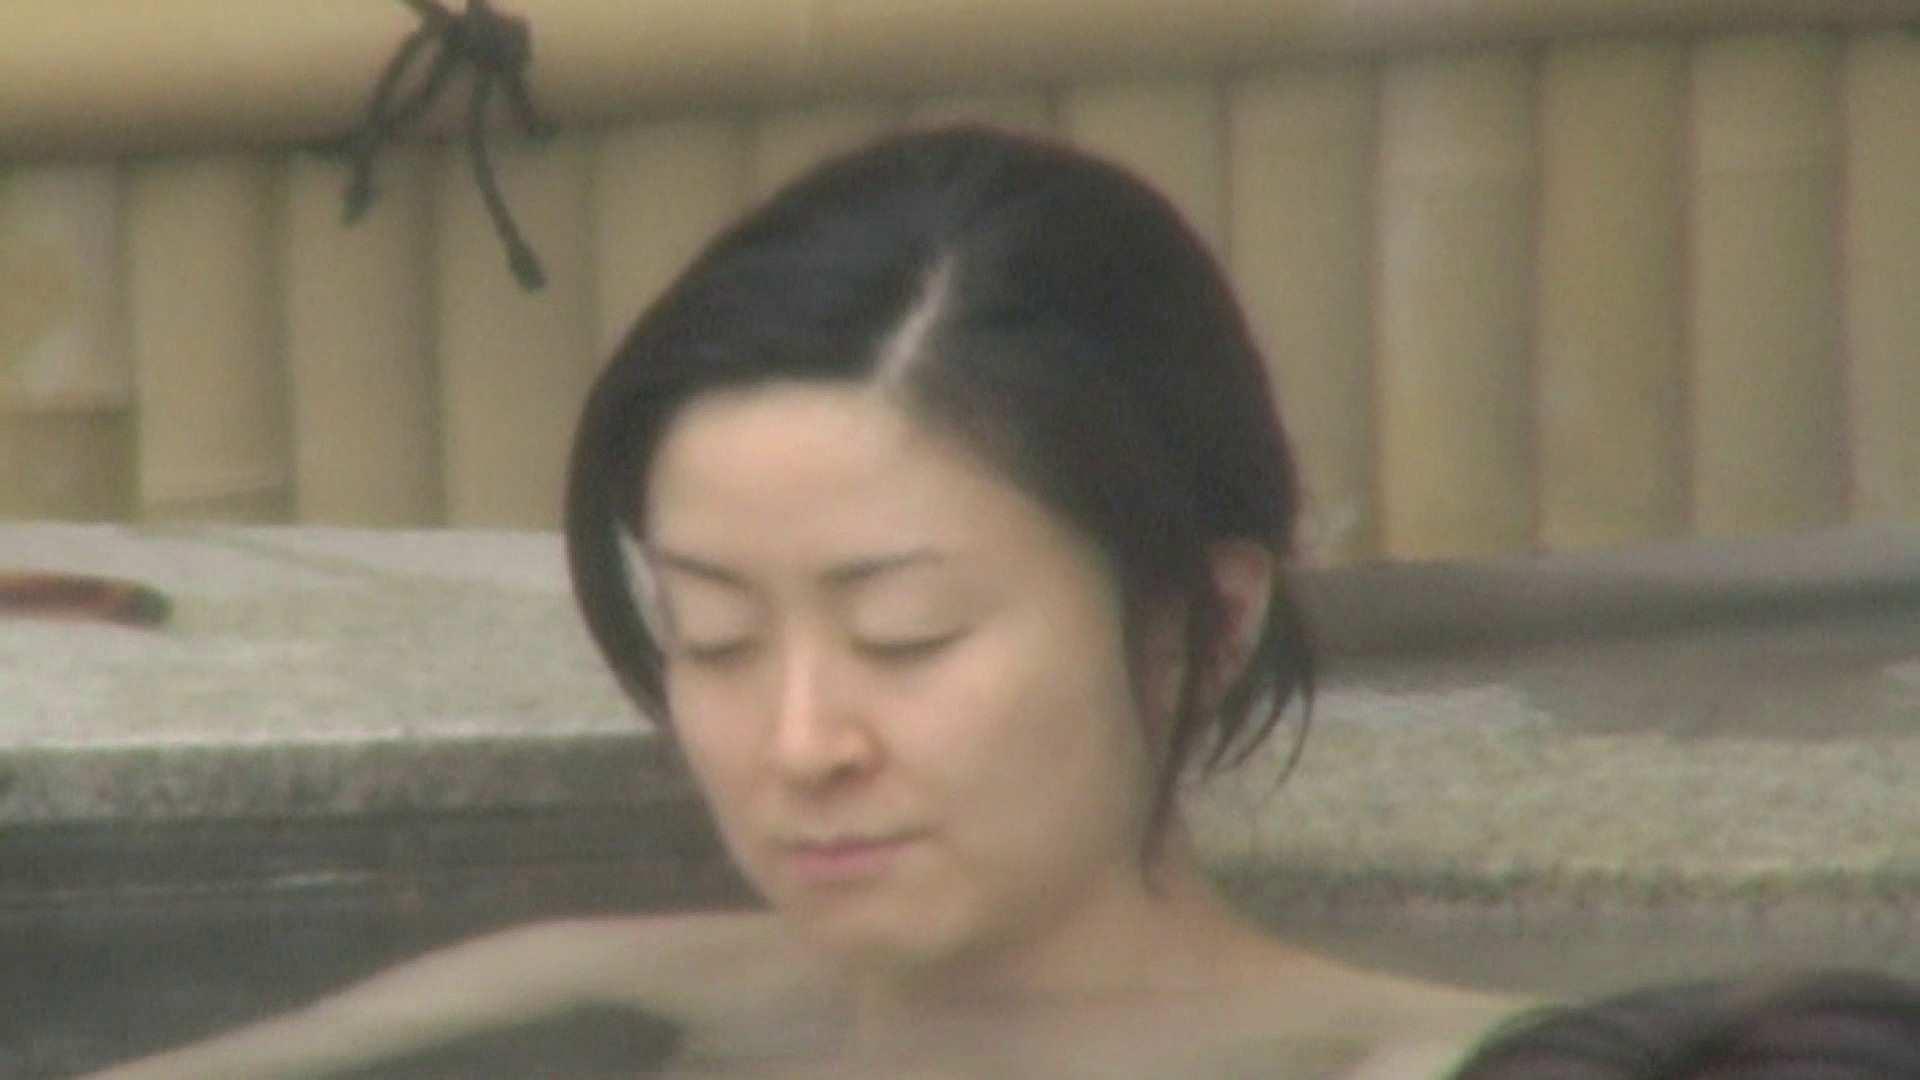 Aquaな露天風呂Vol.548 盗撮  97連発 28